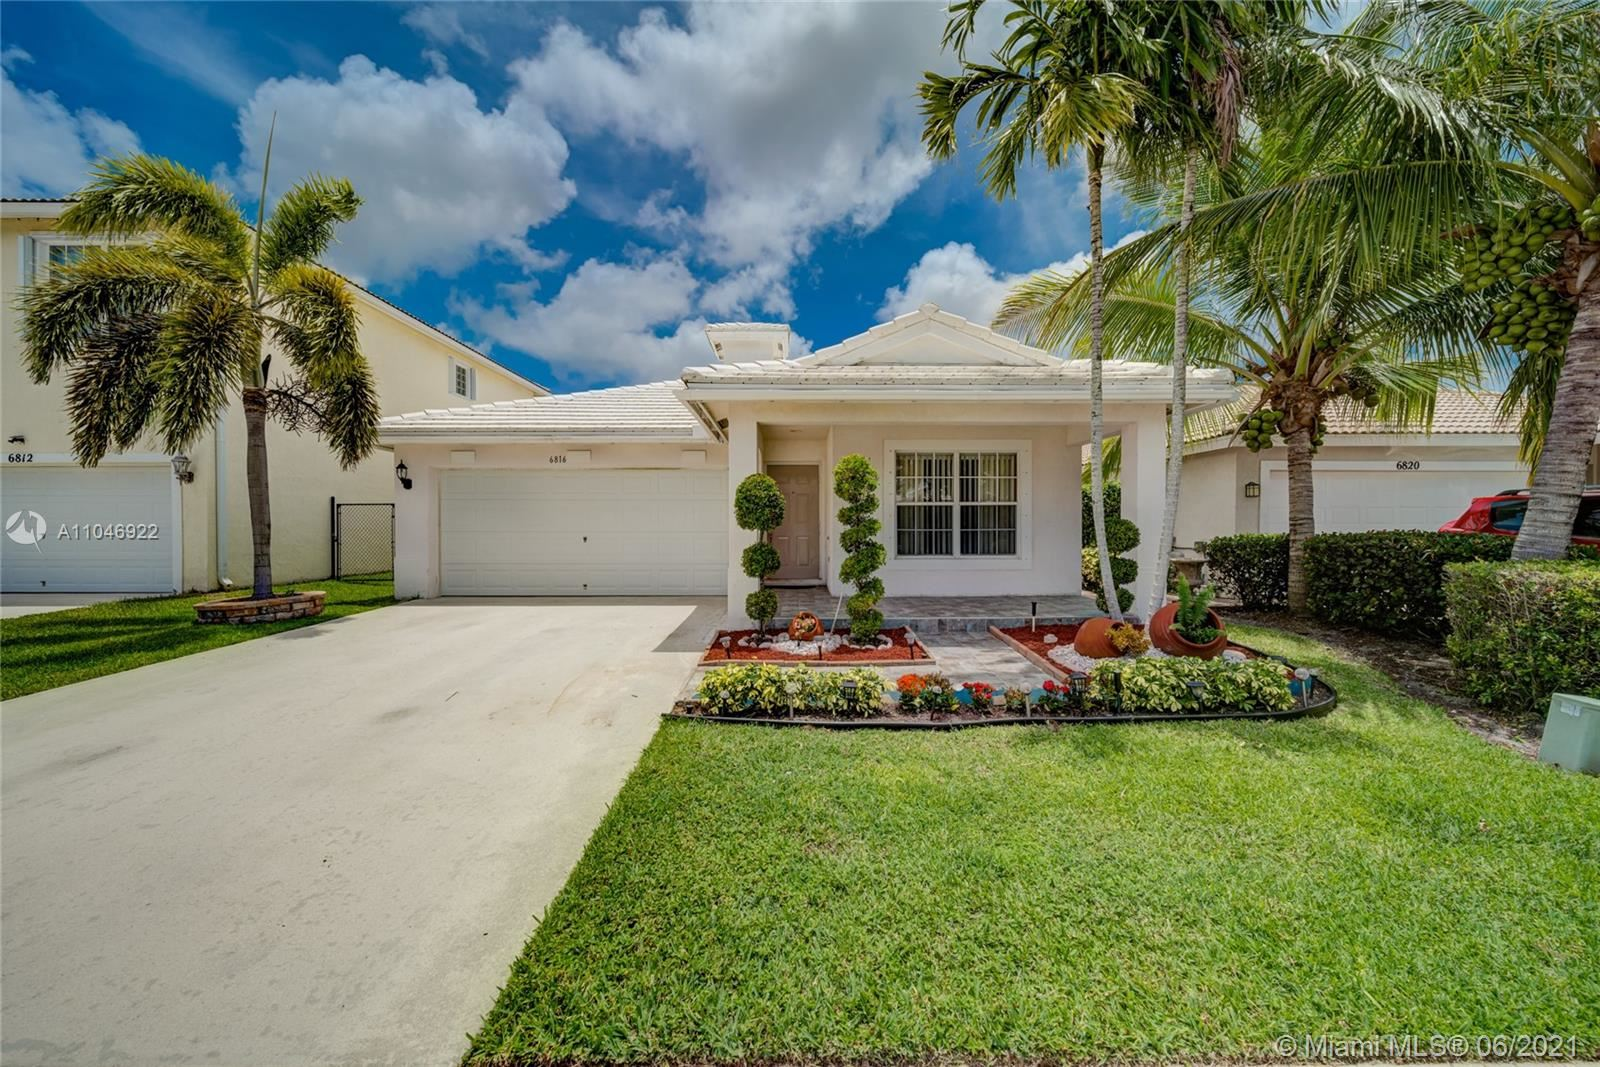 6816 Hendry Dr, Lake Worth, FL 33463 - #: A11046922